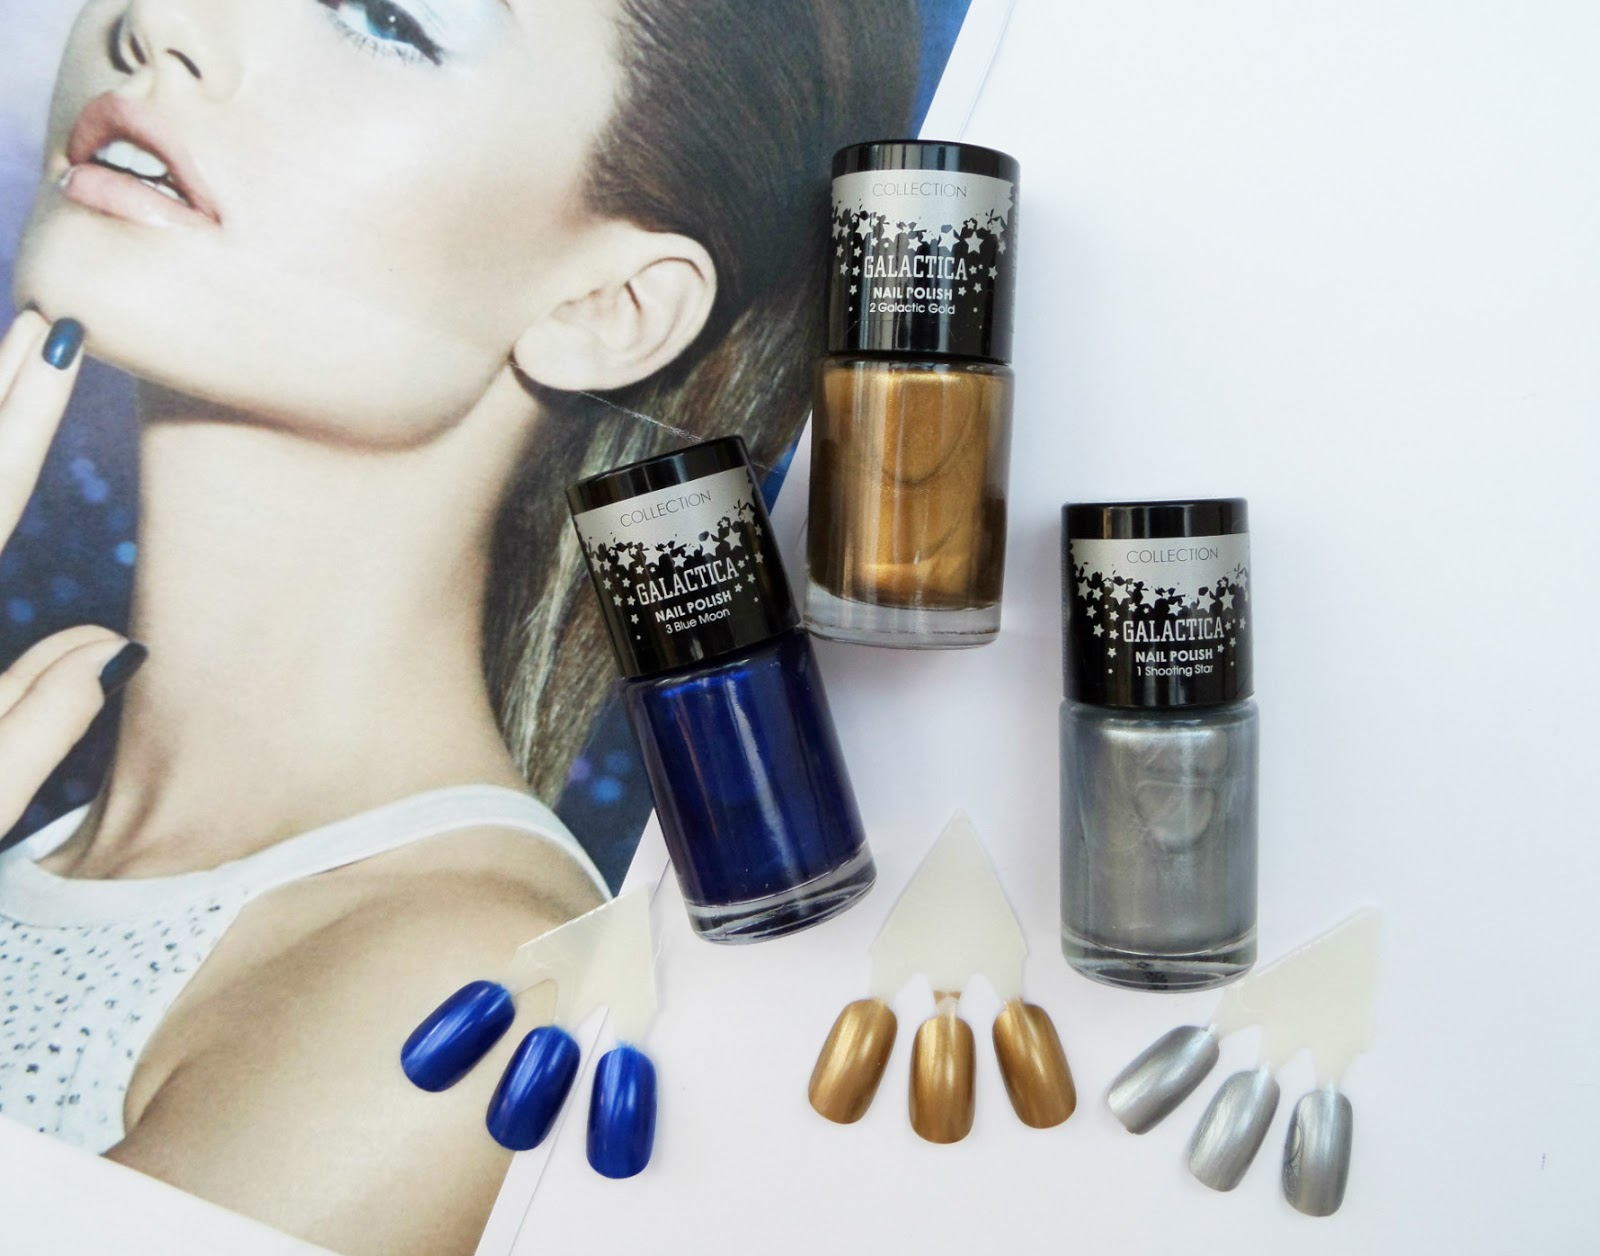 Collection Cosmetics Galactica Range Nail Polishes